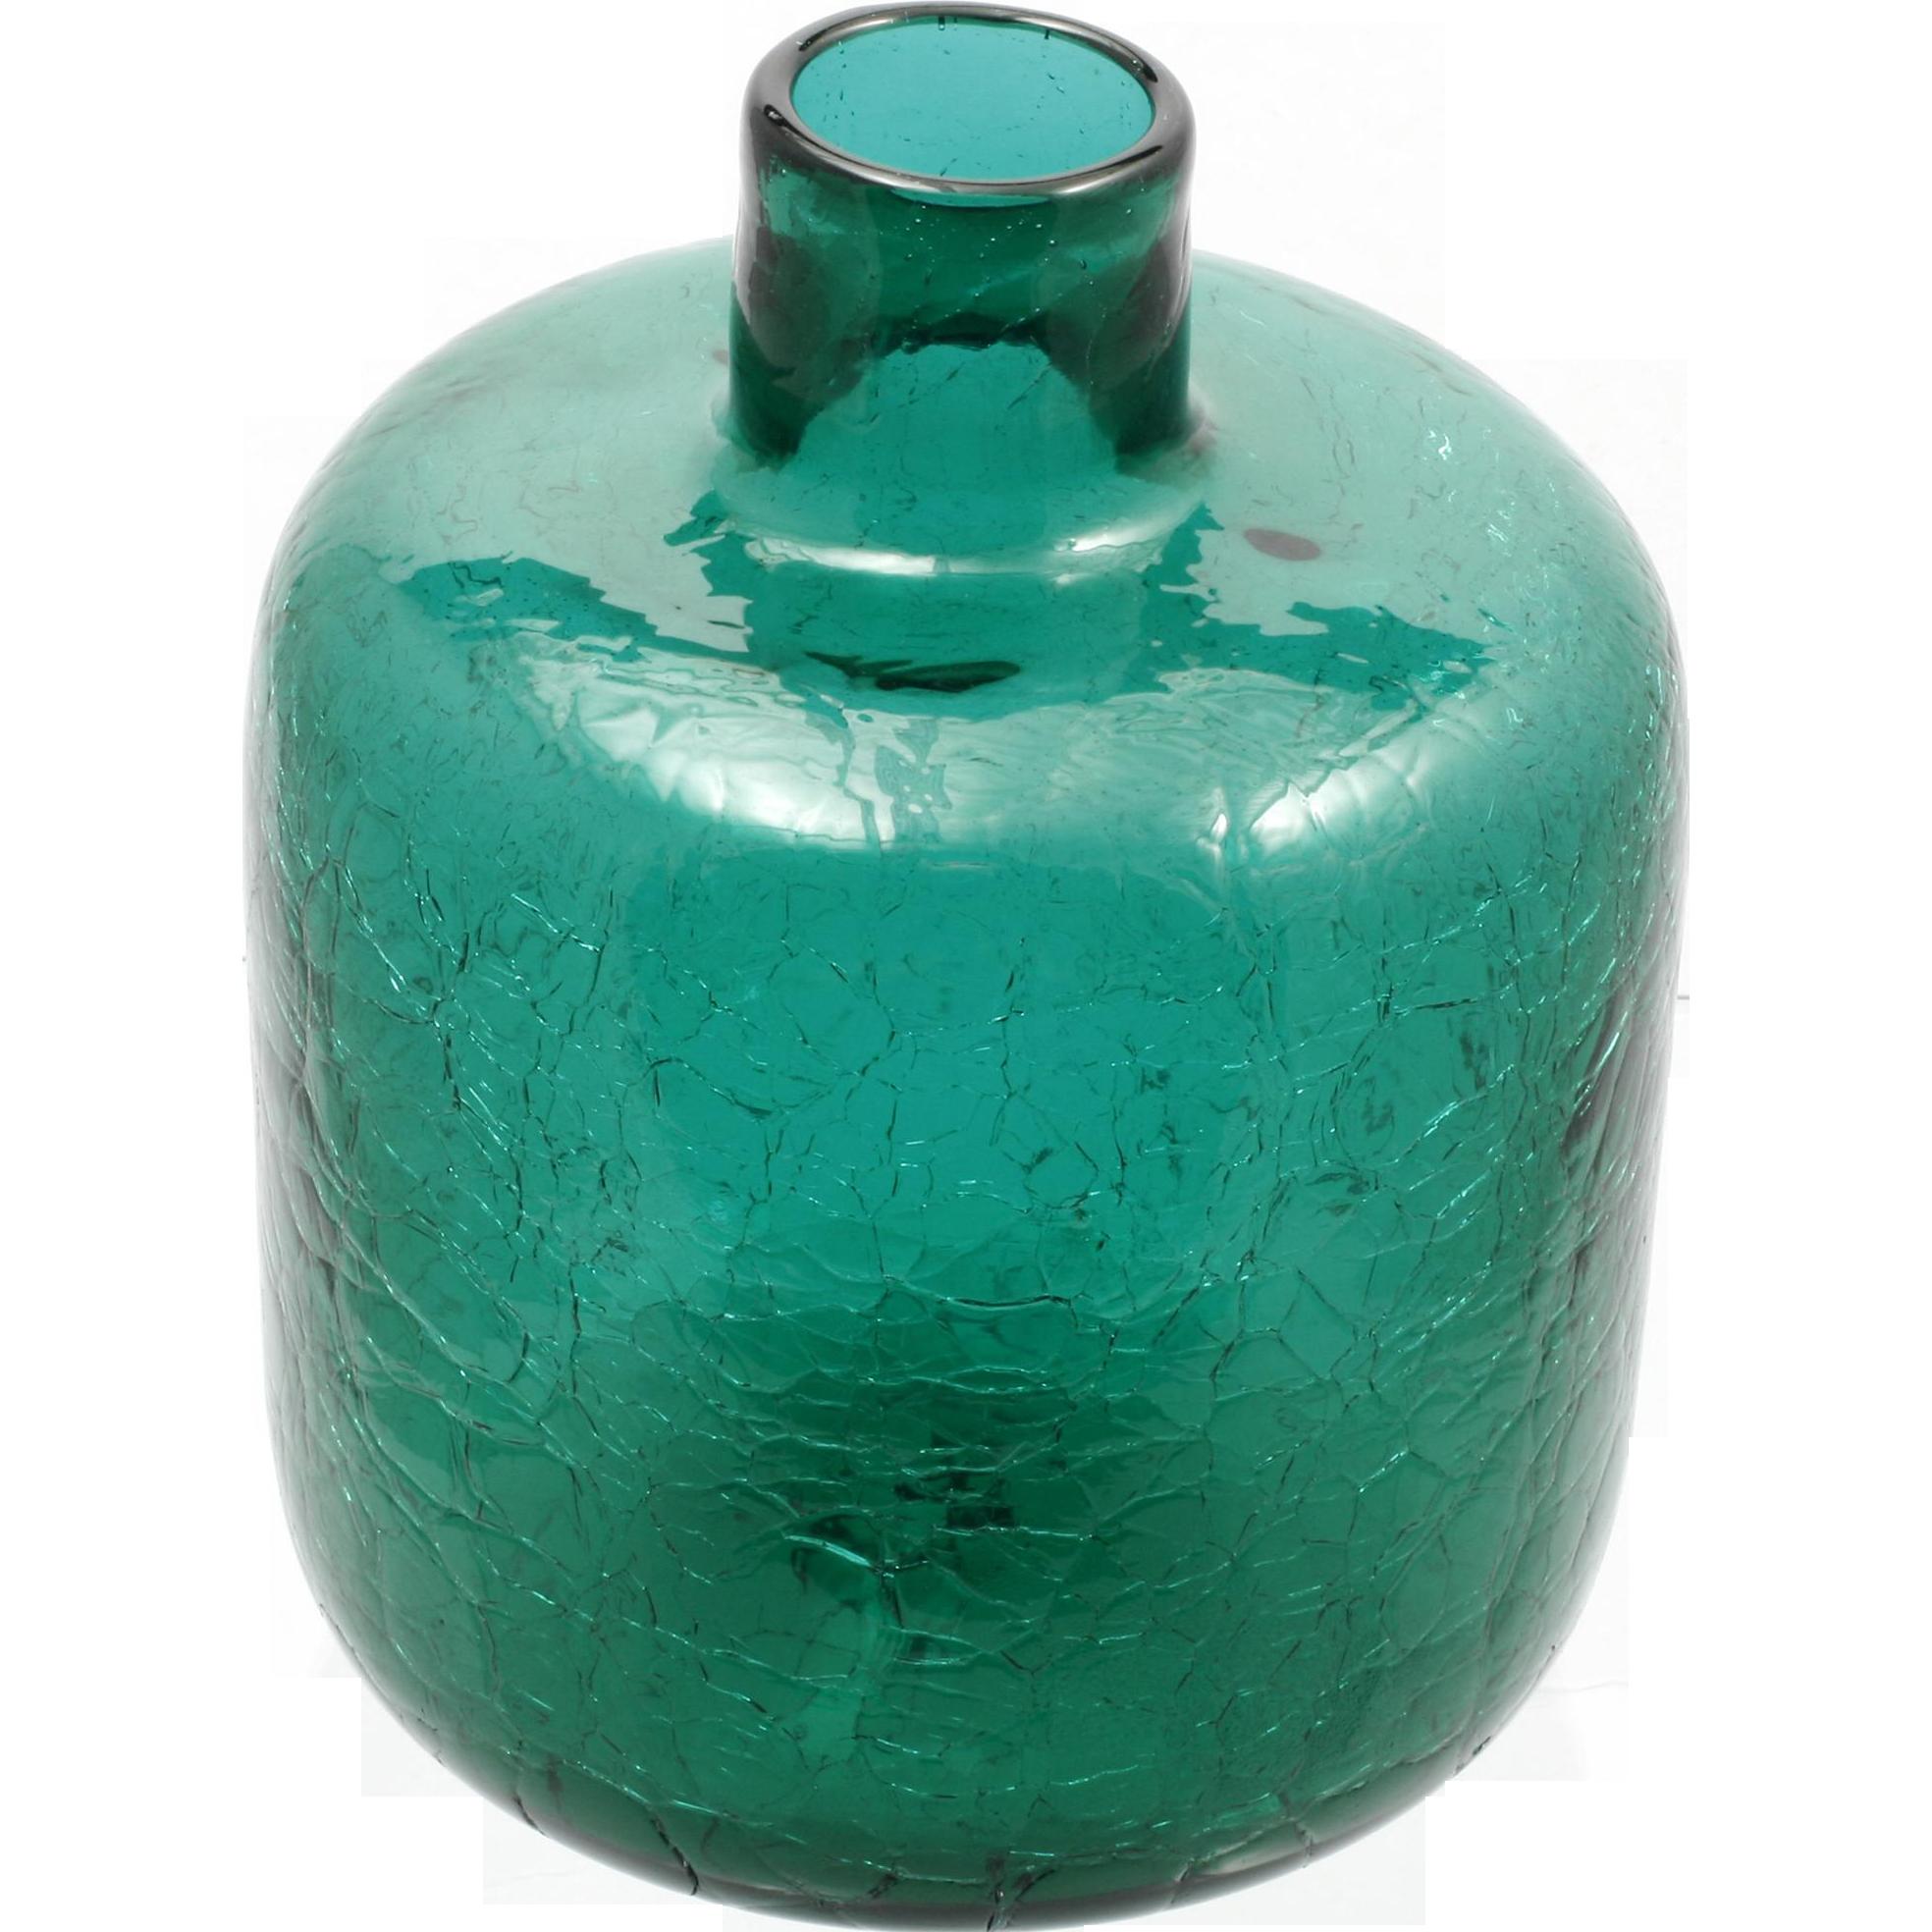 Emerald Green Crackle Glass Vase Blenko Mid Century Modern Vintage